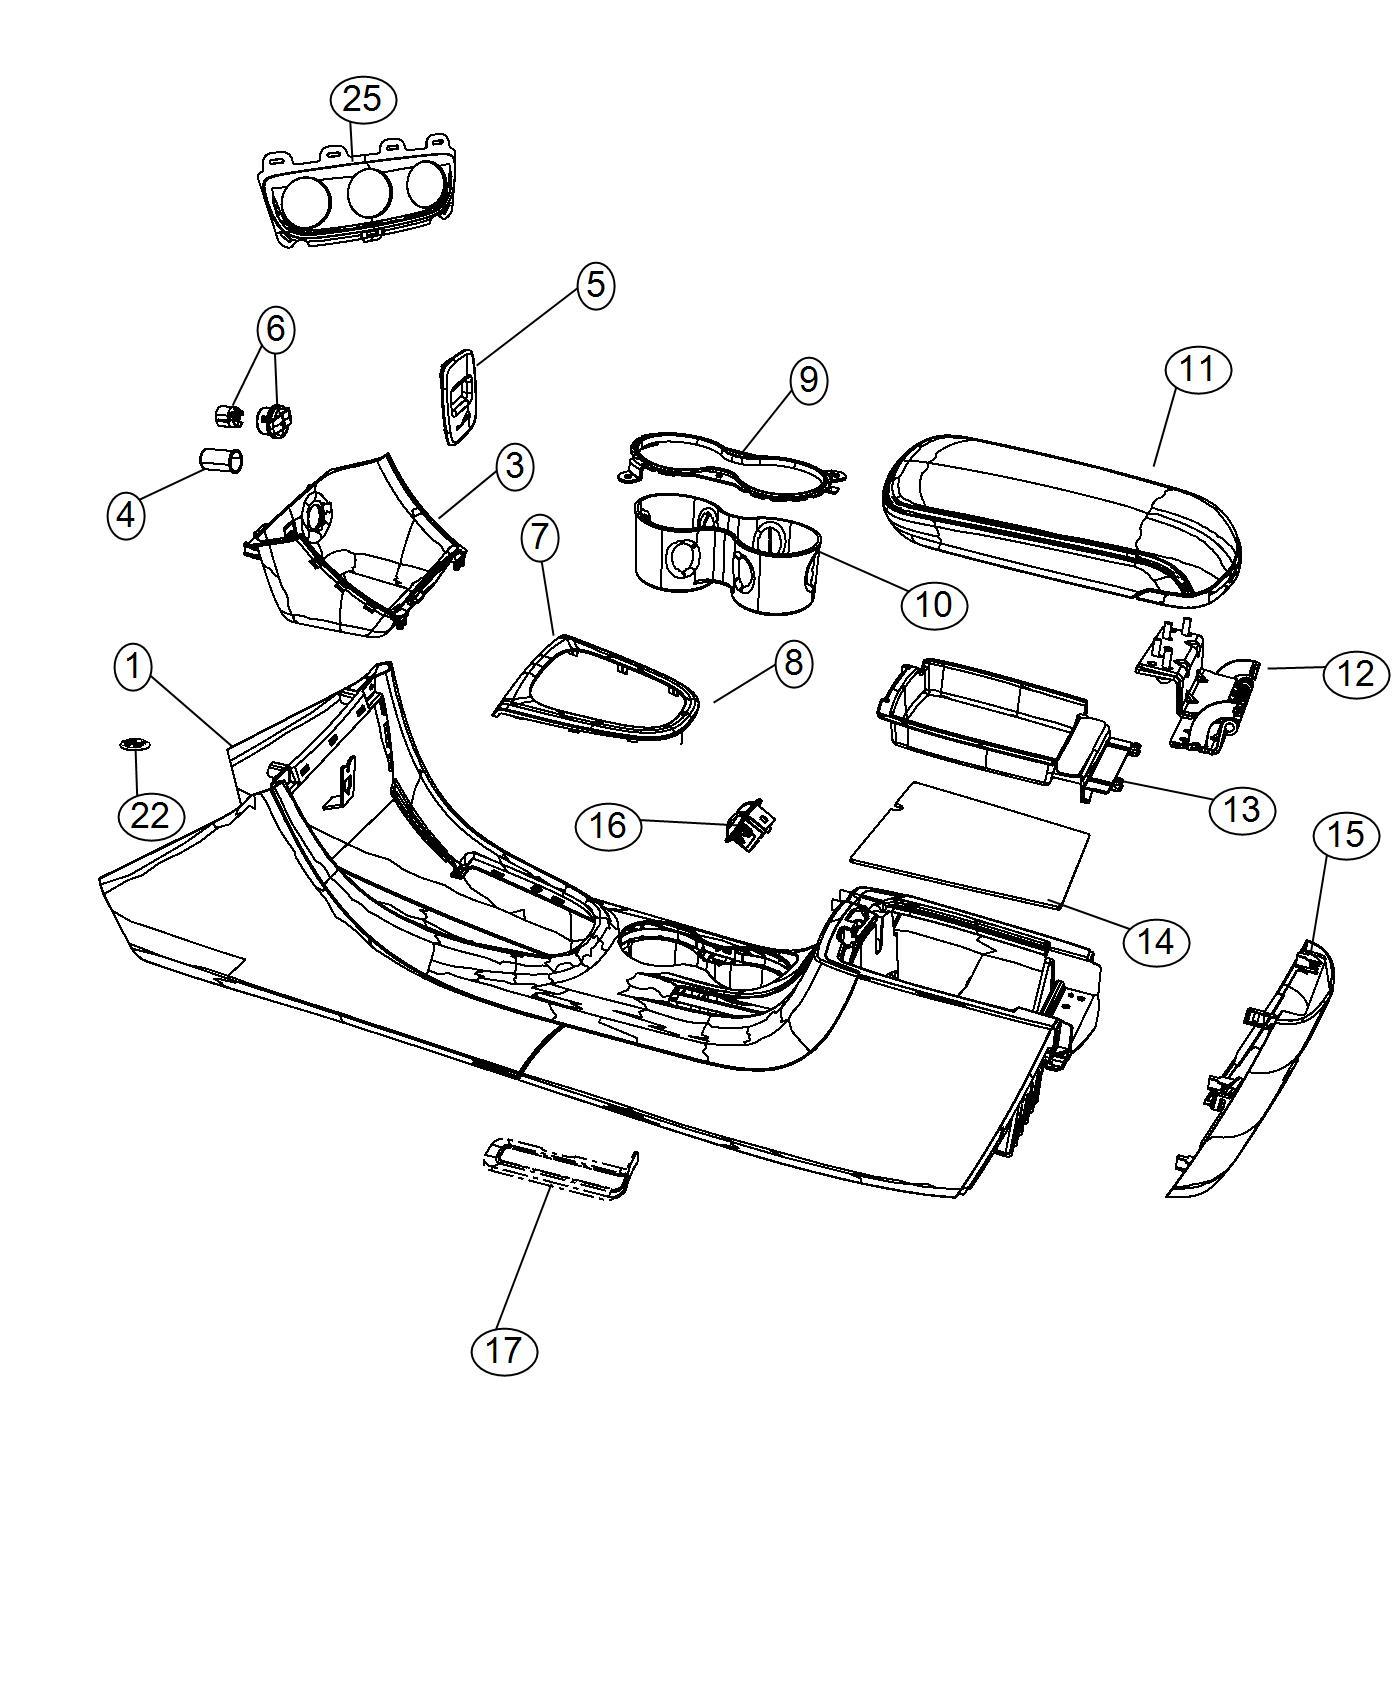 Chrysler Sebring Wiring. Jumper. Universal consumer